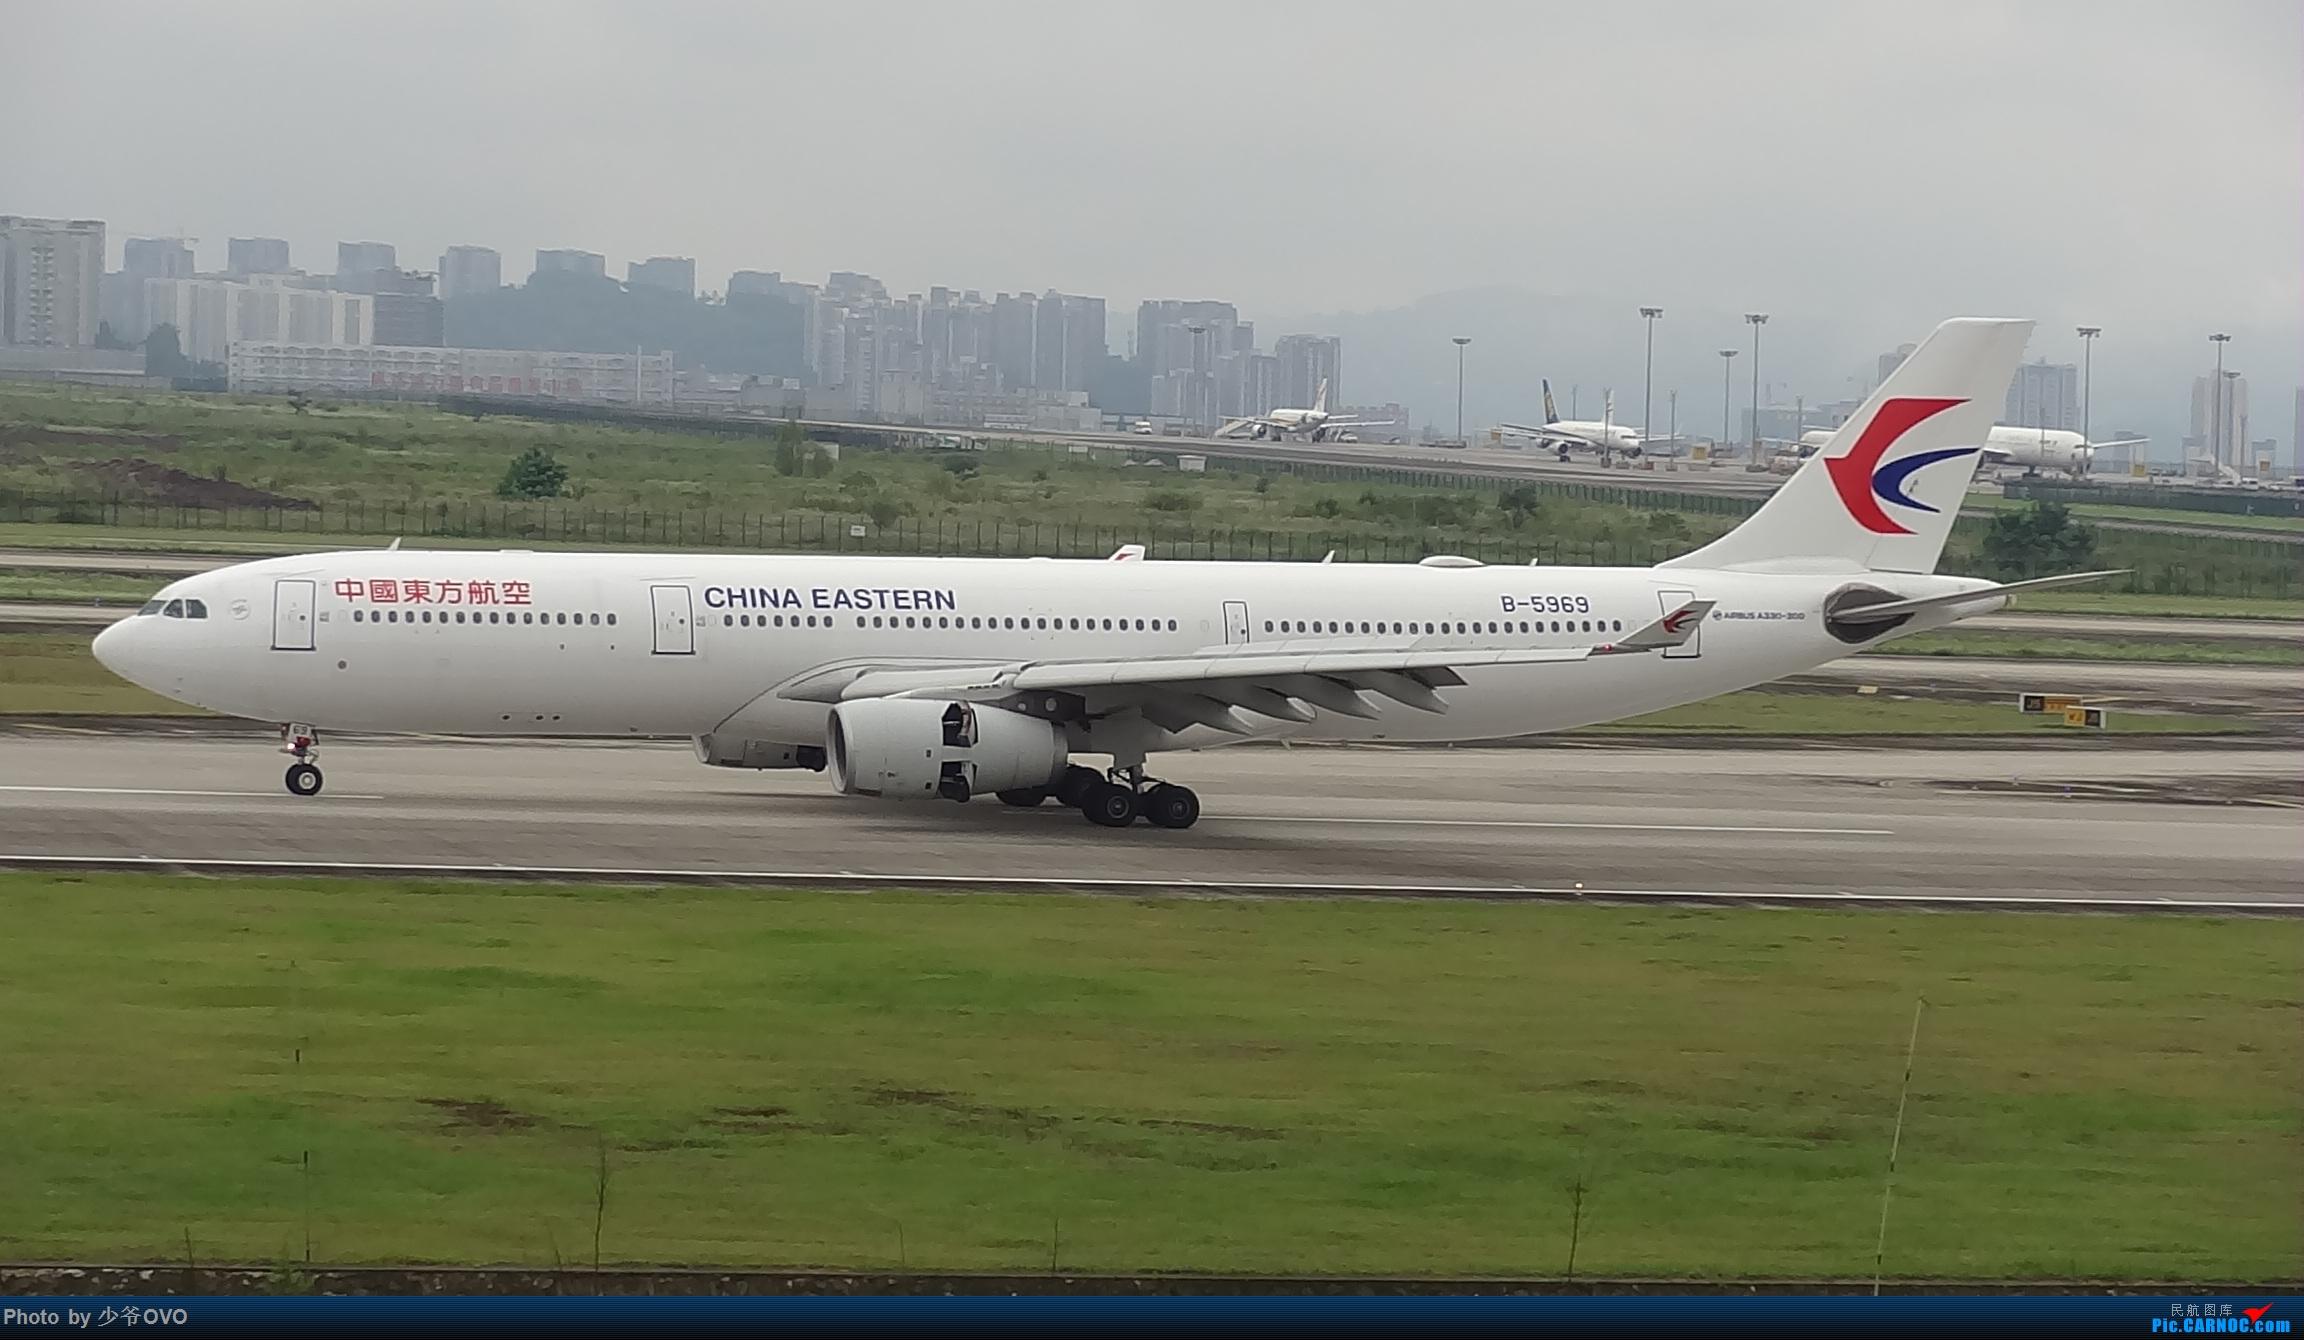 Re:[原创]CKG重庆江北机场拍机 ,中法建交50周年 AIRBUS A330-300 B-5969 中国重庆江北国际机场